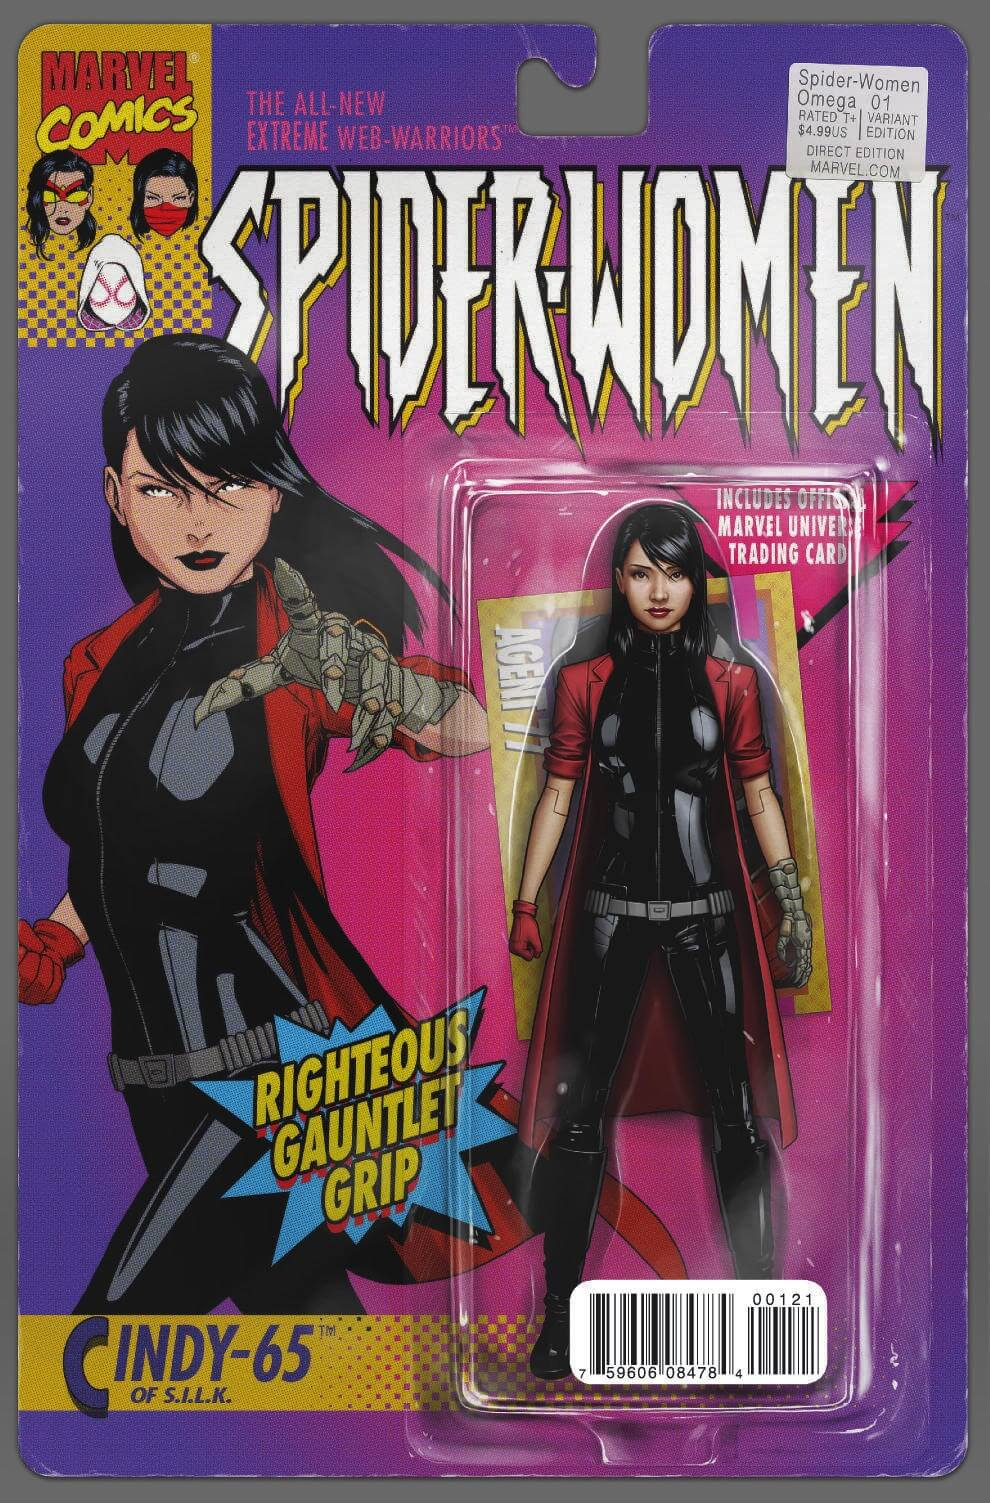 Spider-Women_Omega_1_Christopher_Action_Figure_Variant